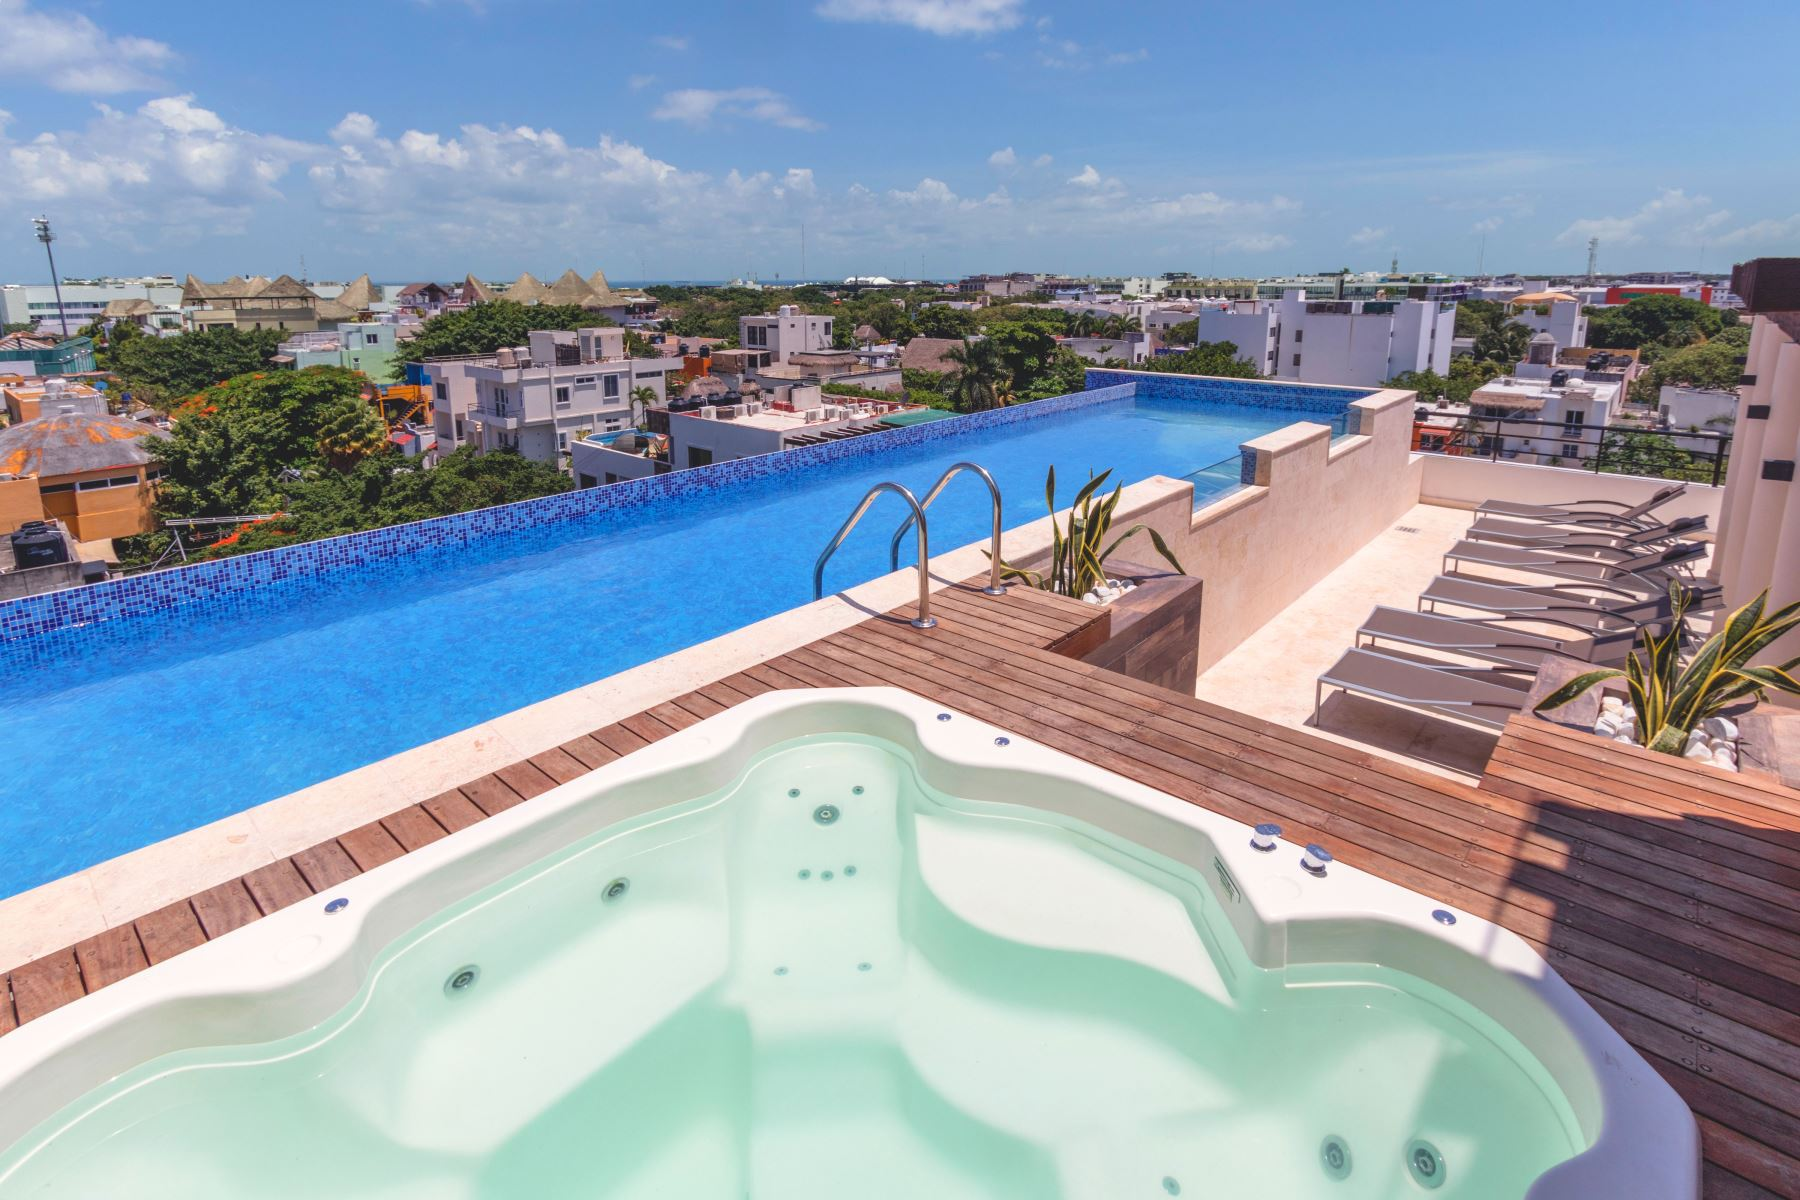 iPlaya 206 Studio Playa del Carmen Condo Home For Sale Real Estate to Buy